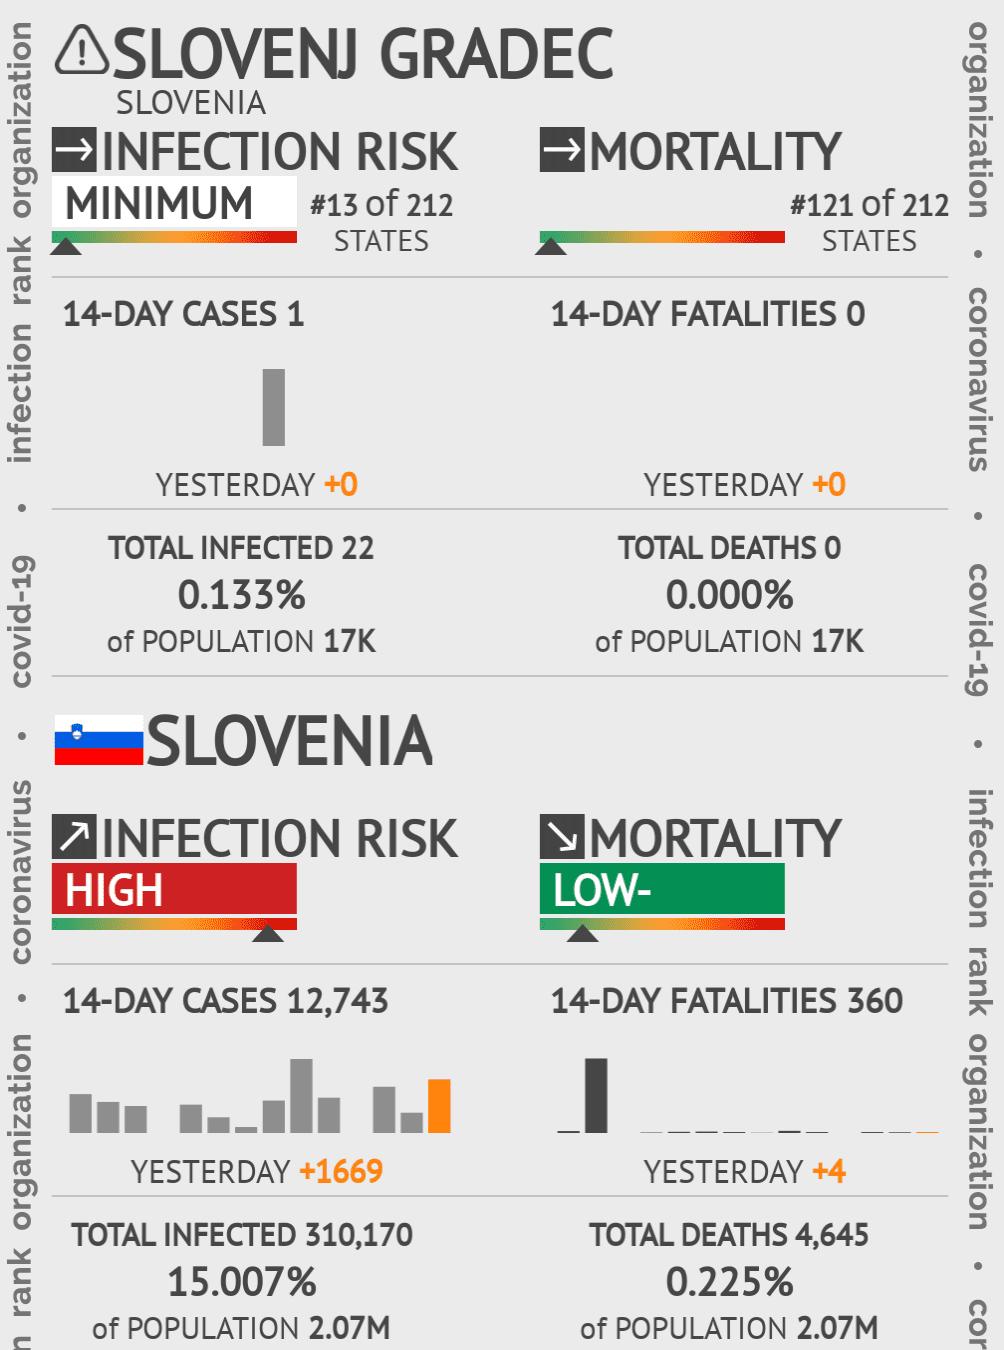 Slovenj Gradec Coronavirus Covid-19 Risk of Infection on May 14, 2020